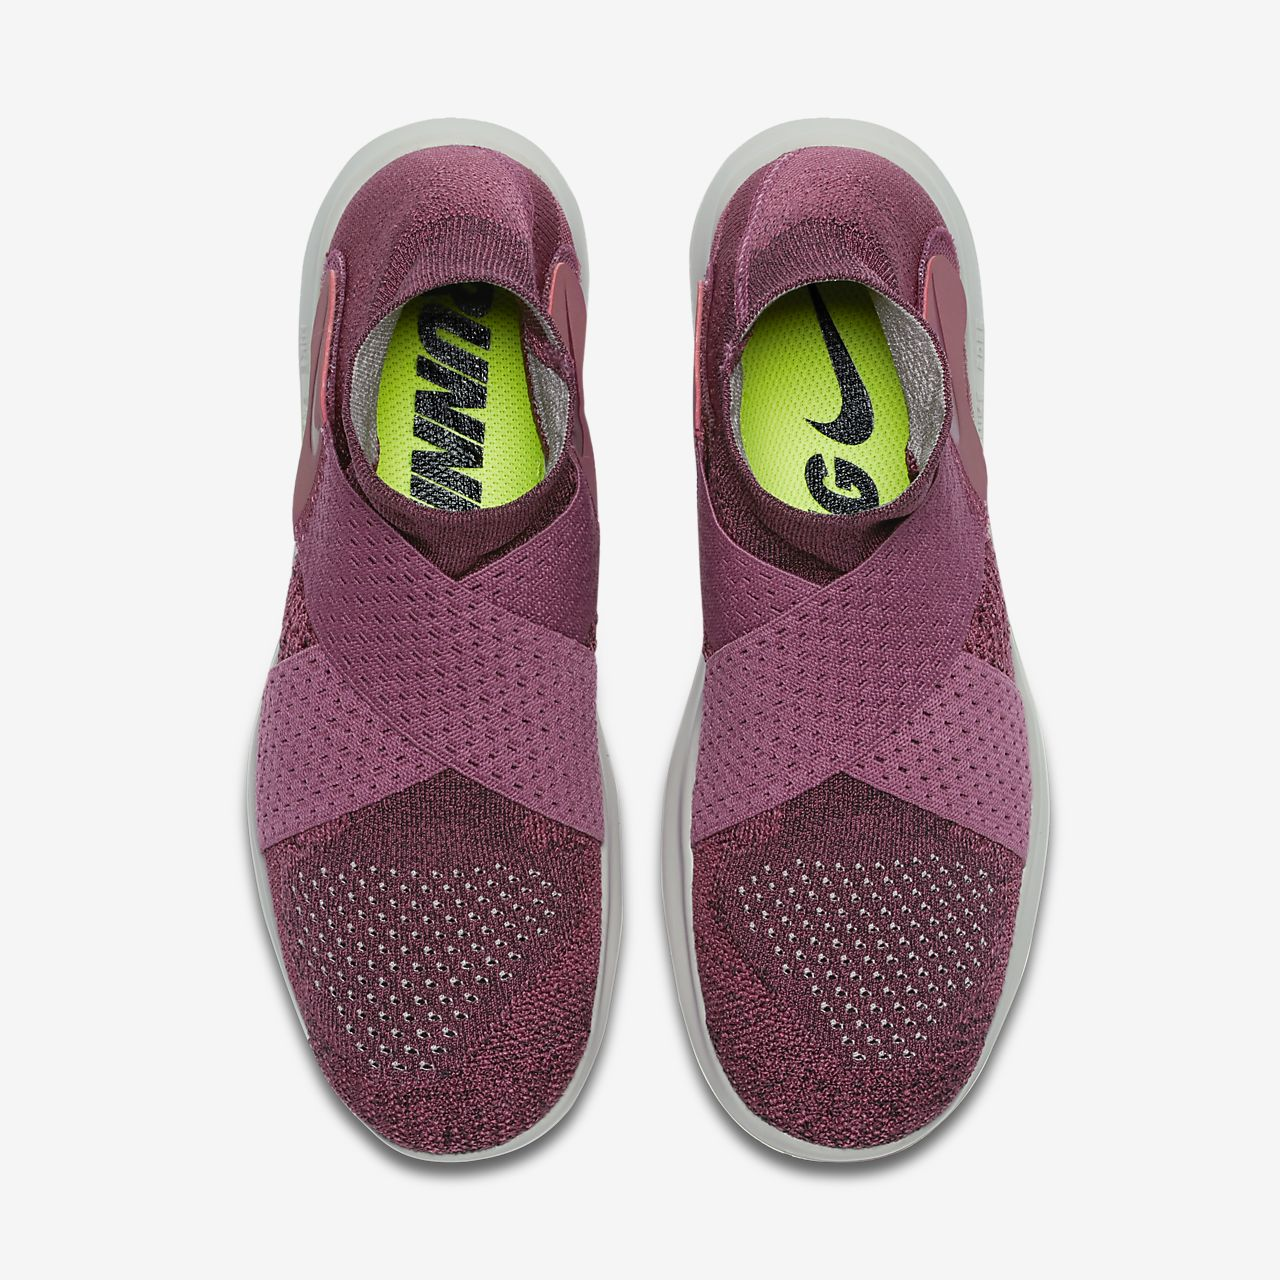 11d0e47bc7e1 Nike Free RN Motion Flyknit 2017 Women s Running Shoe. Nike.com AE